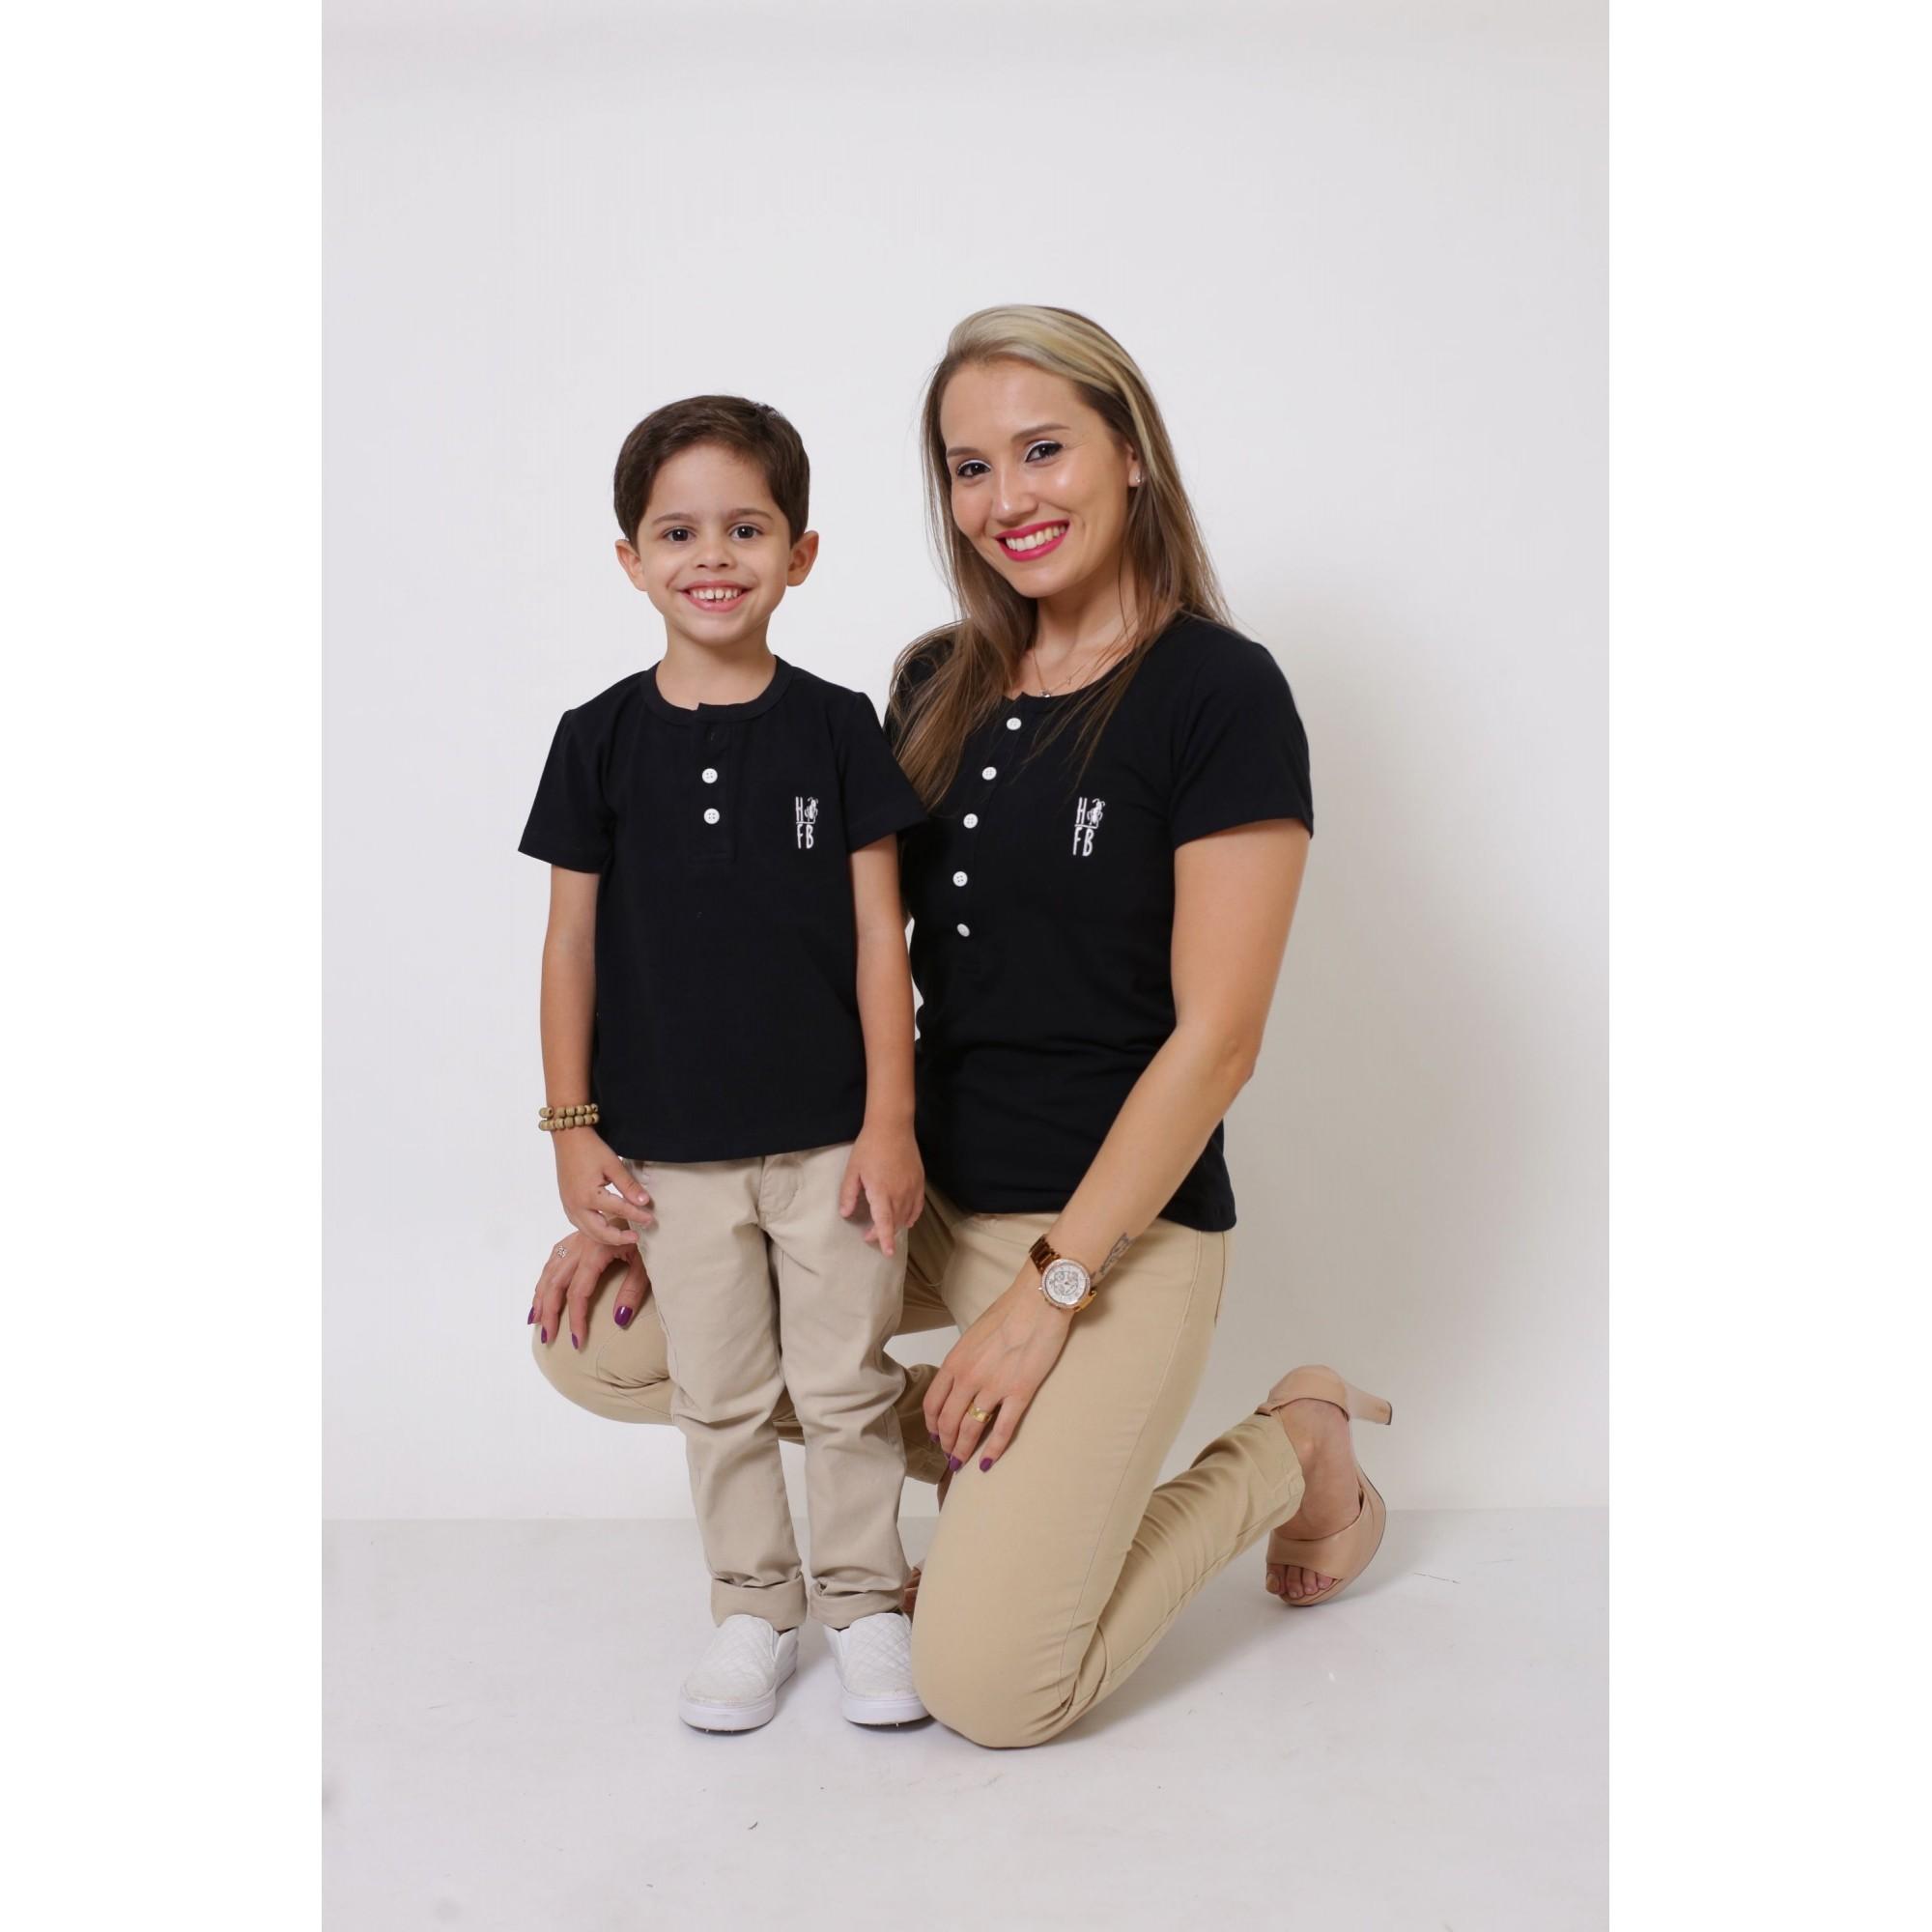 MÃE E FILHO > Kit 02 Peças - T-Shirts ou Body Henley - Preto [Coleção Tal Mãe Tal Filho]  - Heitor Fashion Brazil